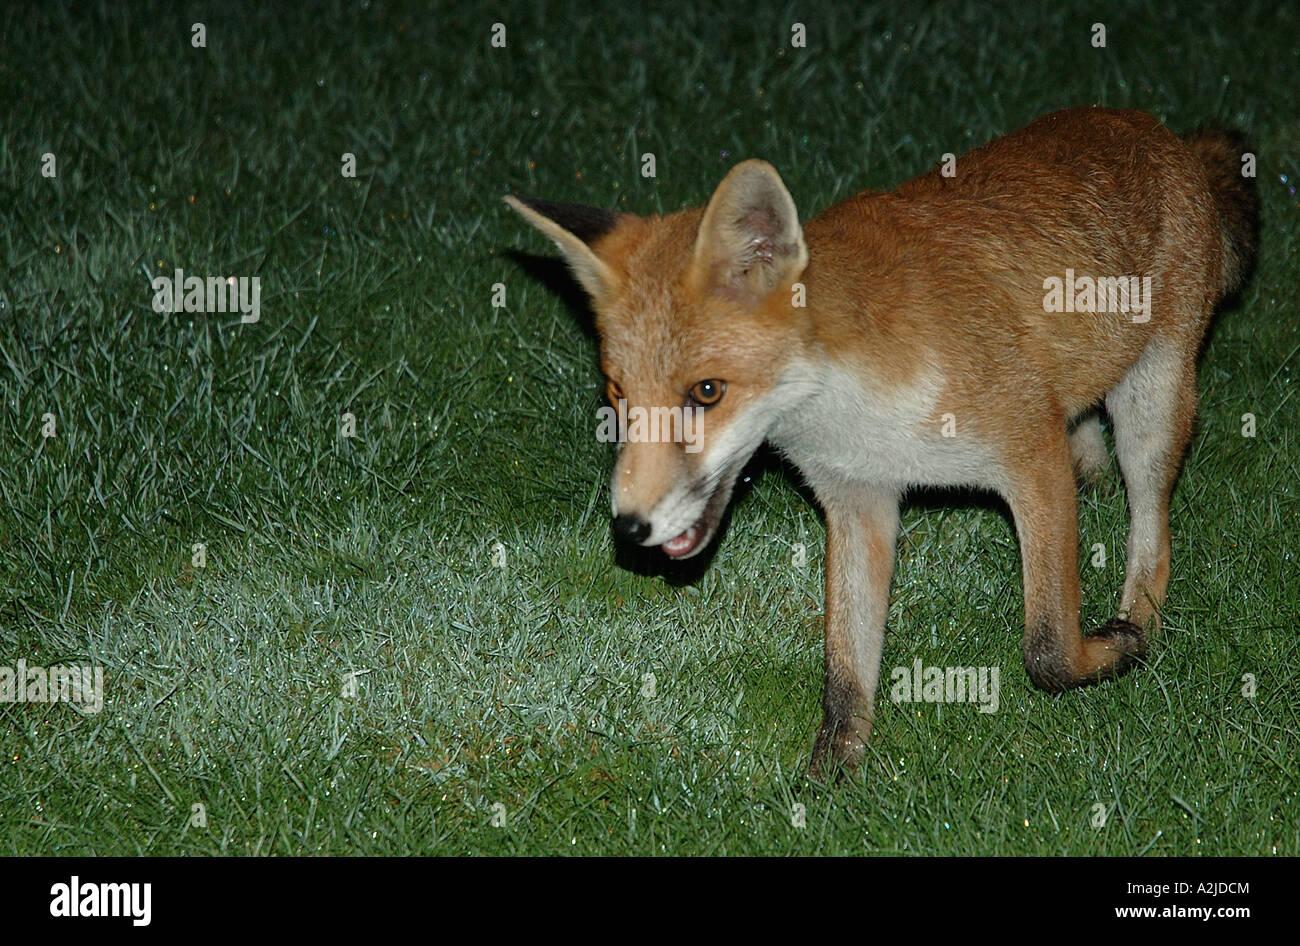 Fuchs Im Garten Stockfoto Bild 10535203 Alamy